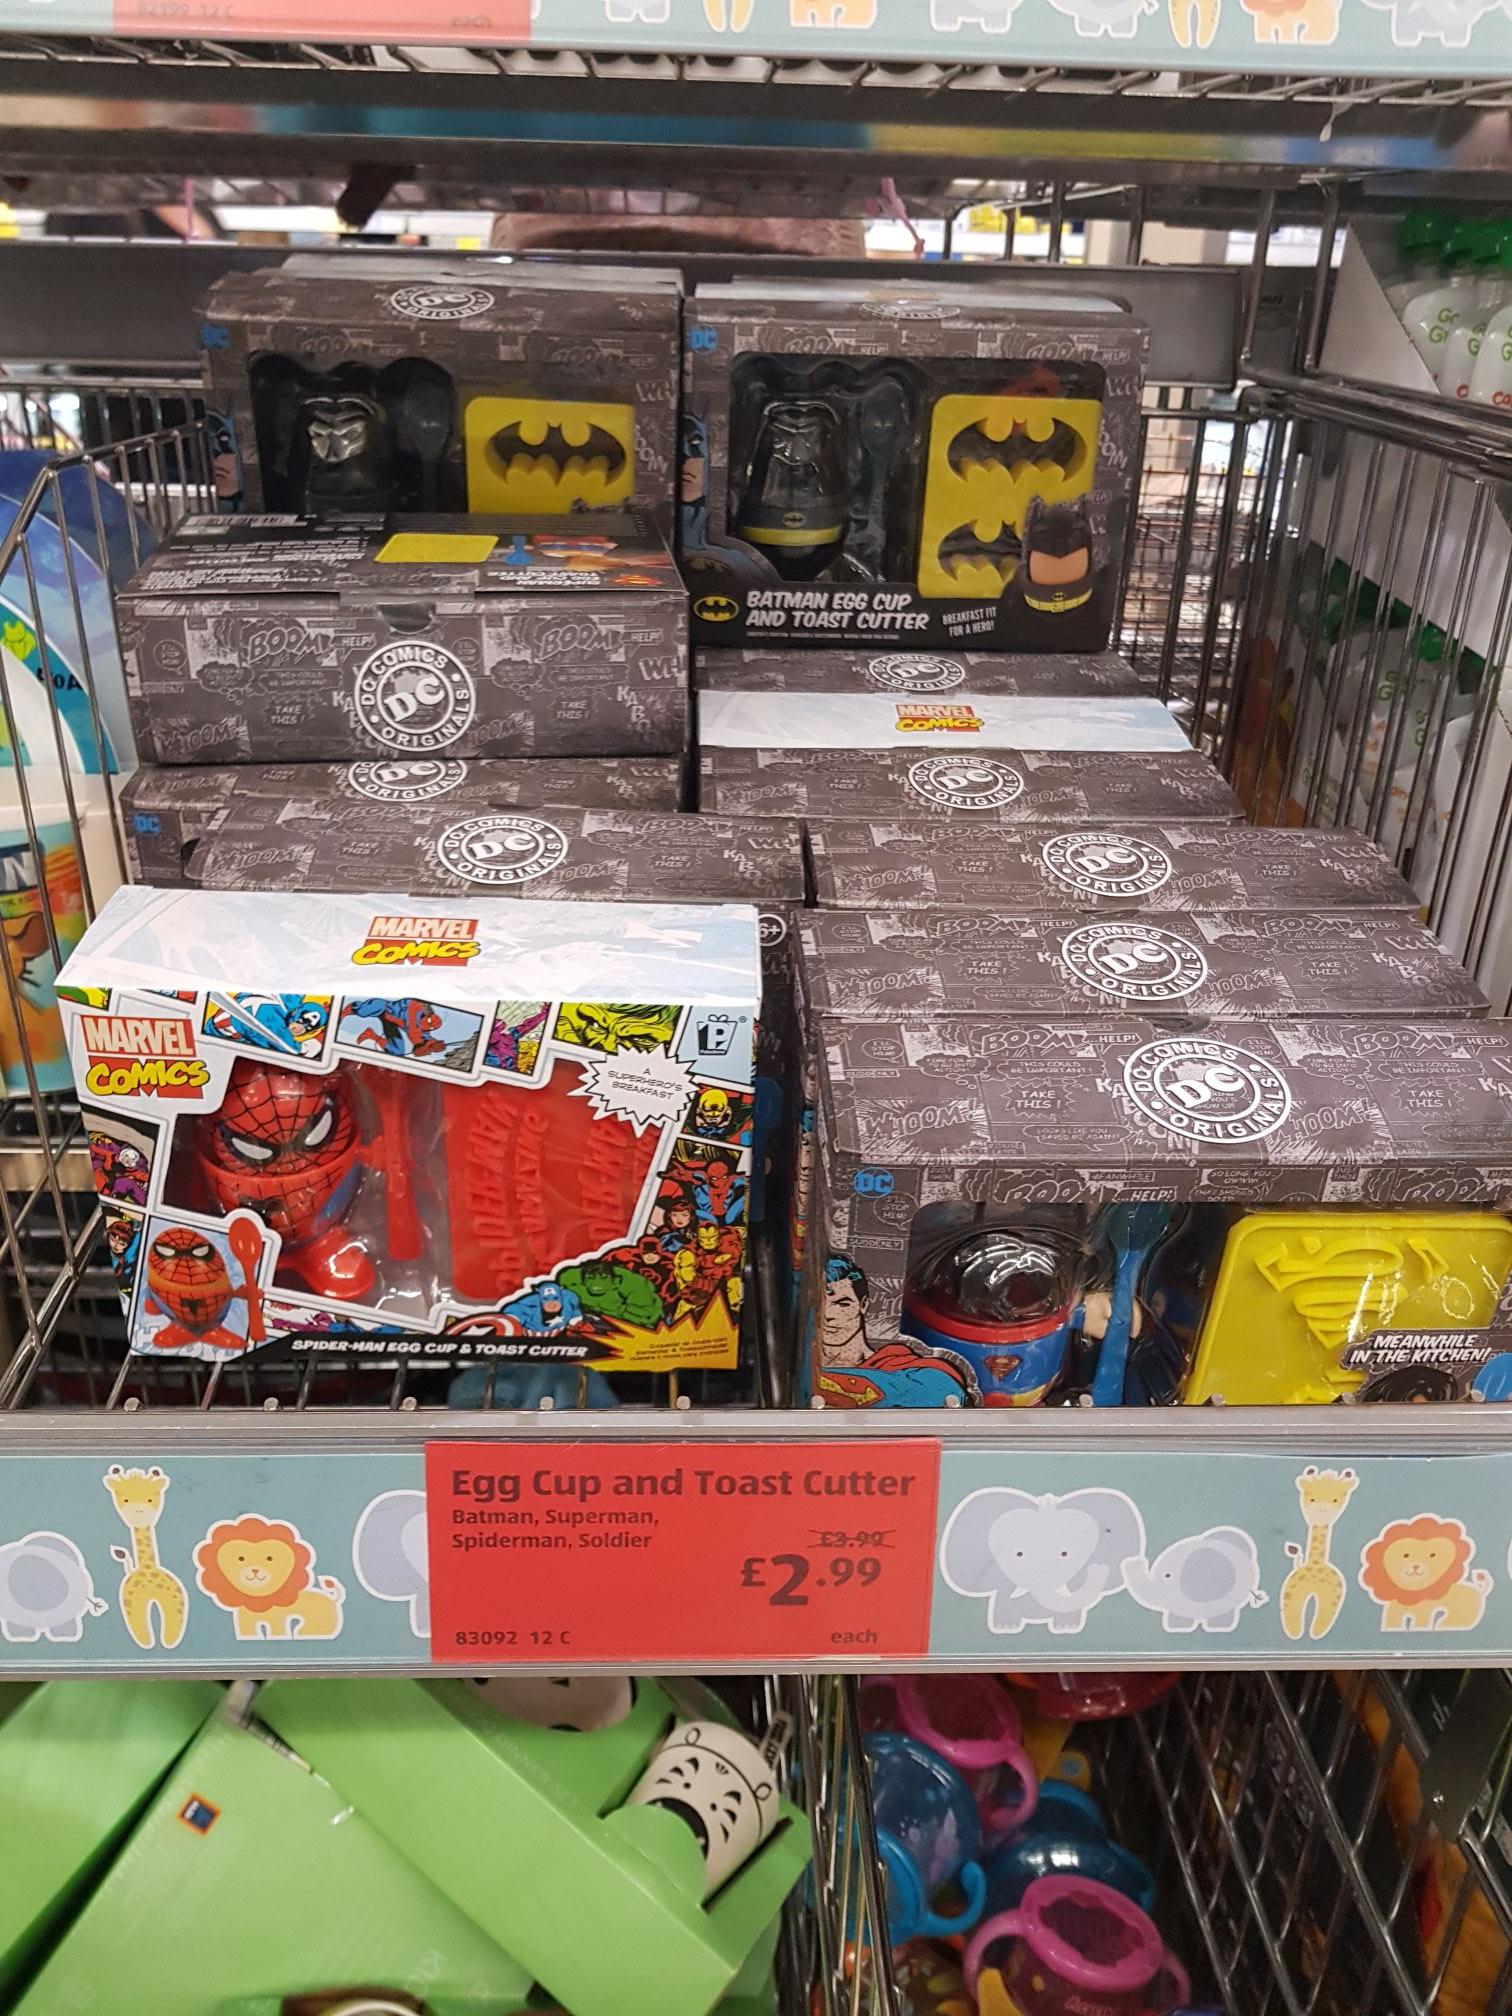 Aldi - DC & Marvel Comics - Egg Cup & Cutter - £2.99